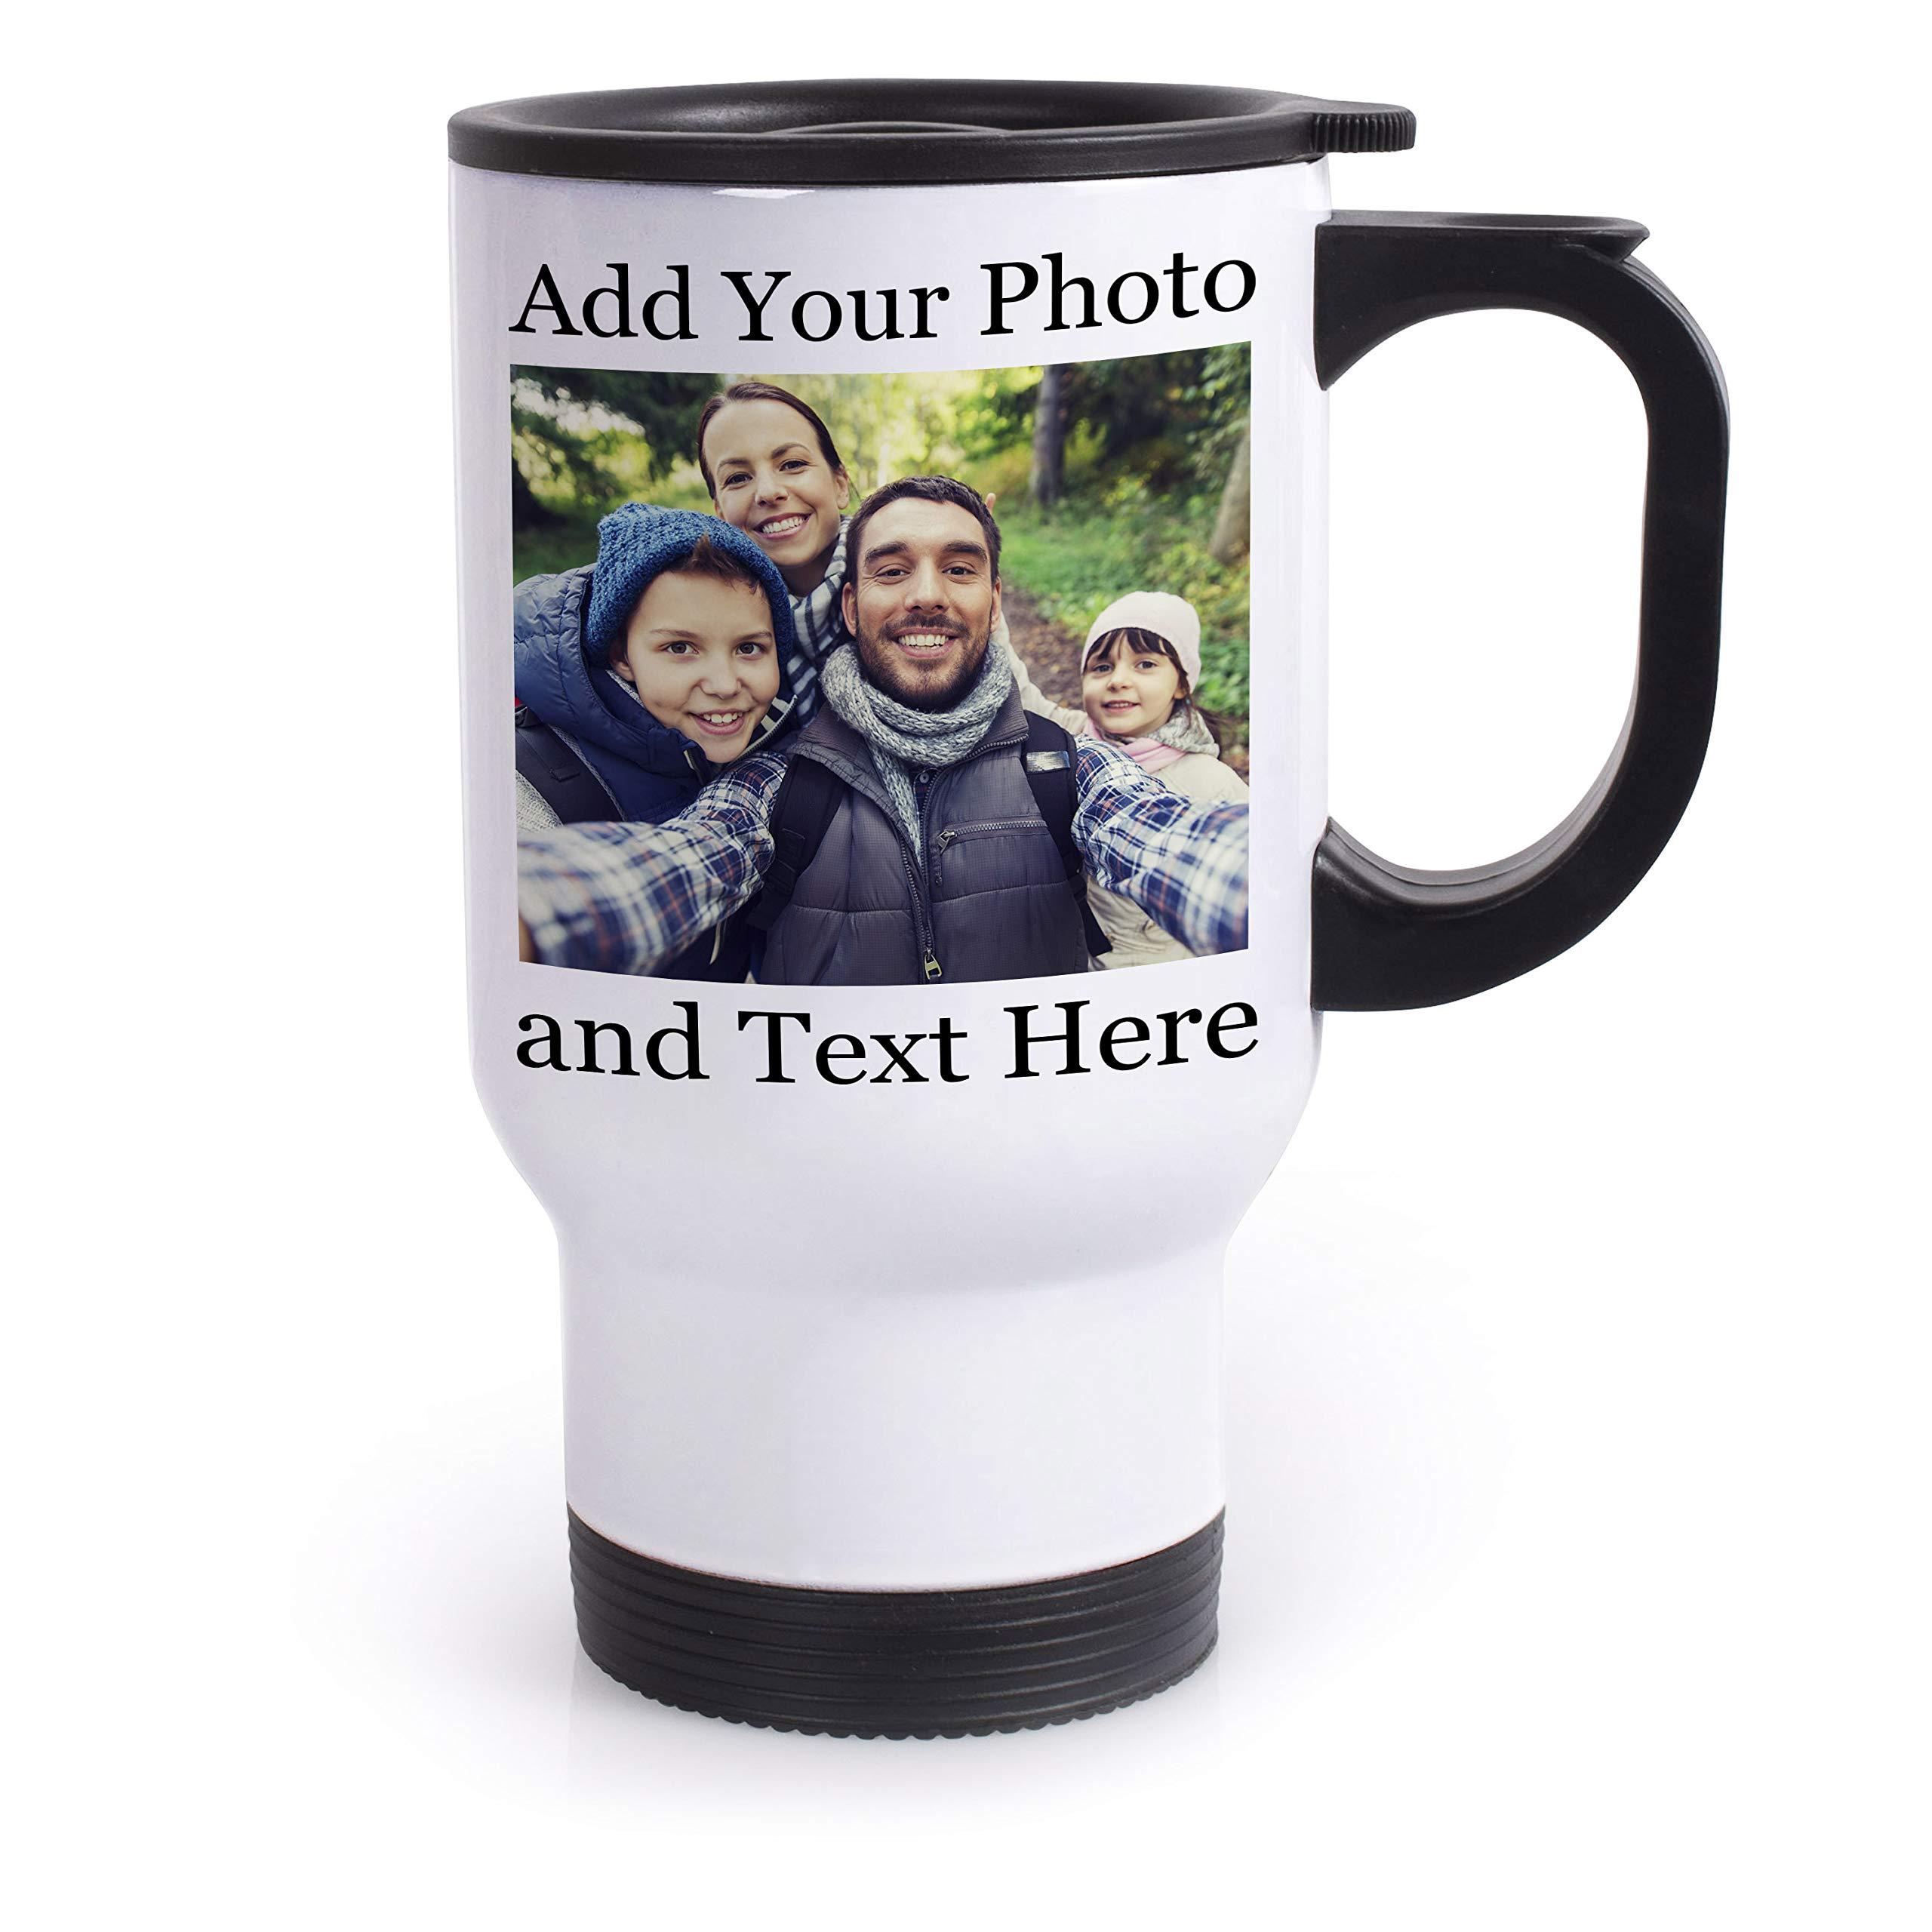 Personalized Custom Travel Mug - Add Your Photo, Text, Logo, Image - 8 Different Fonts & Colors - 14oz Travel Tumbler with Lid Coffee Mug & Tea Cup, Customizable Travel Mug